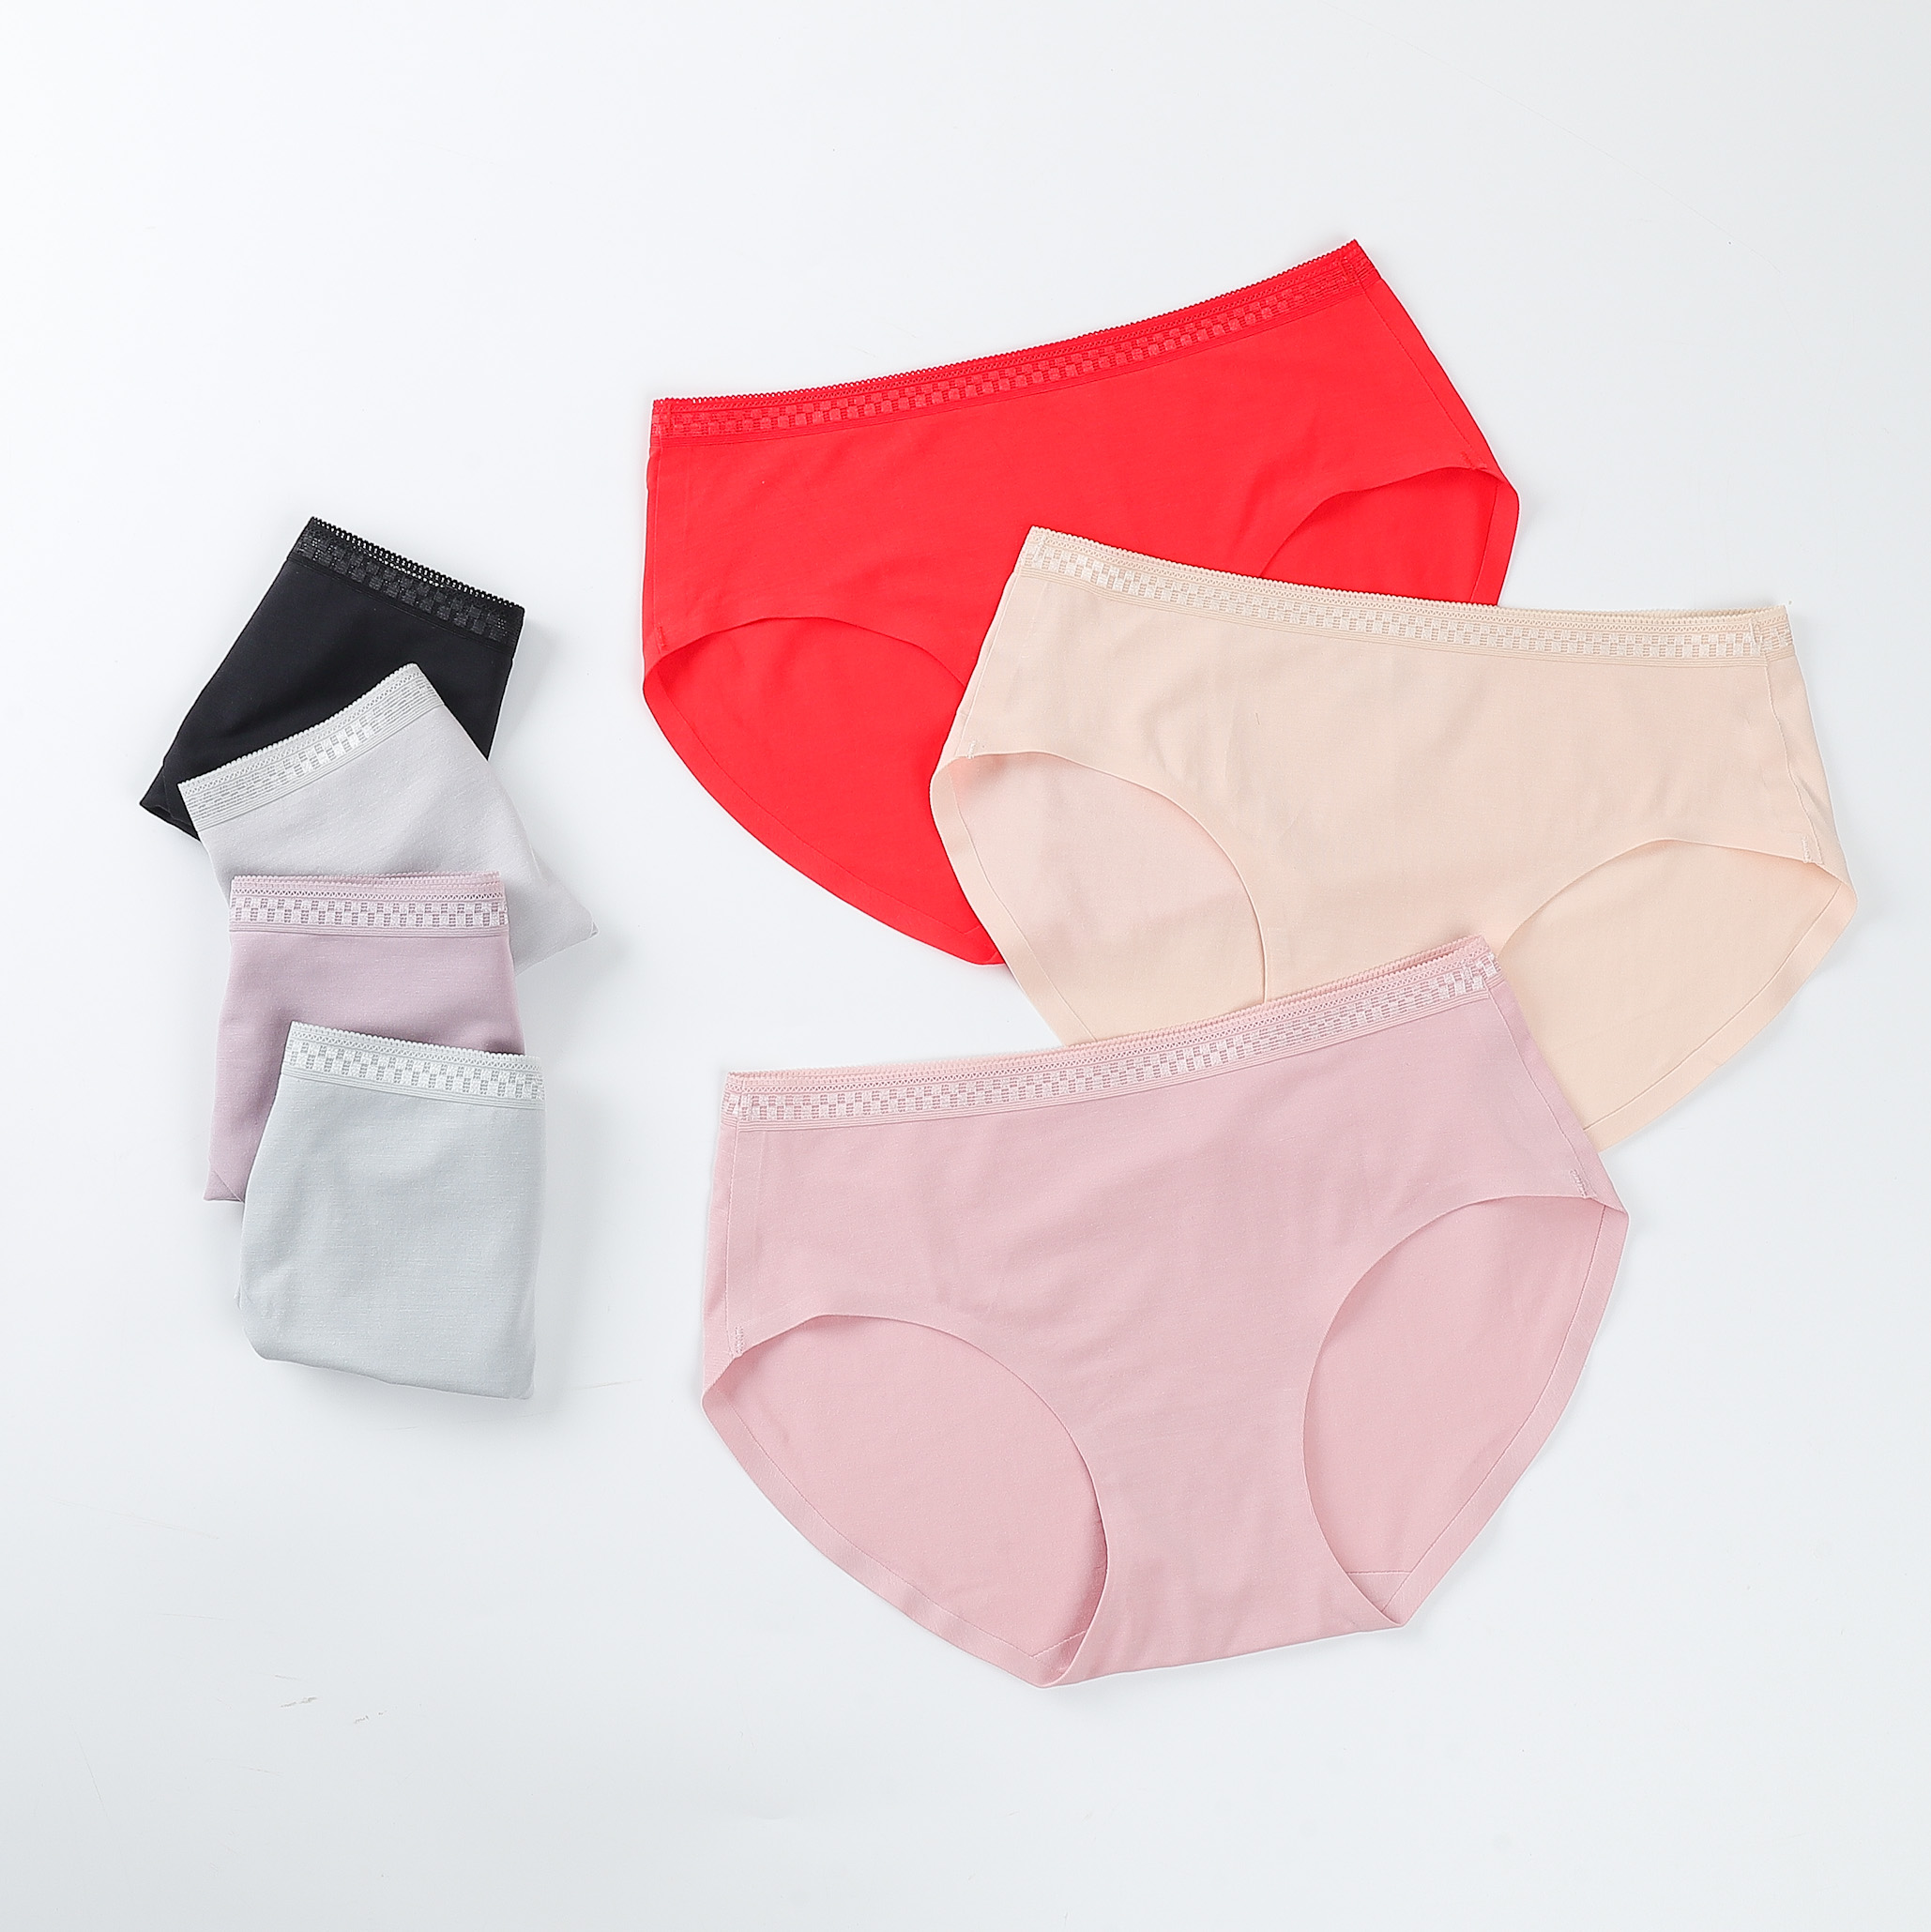 Wholesale women seamless underwear panty One Piece ice silk sexy girls ladies women's panties Seamless underwear